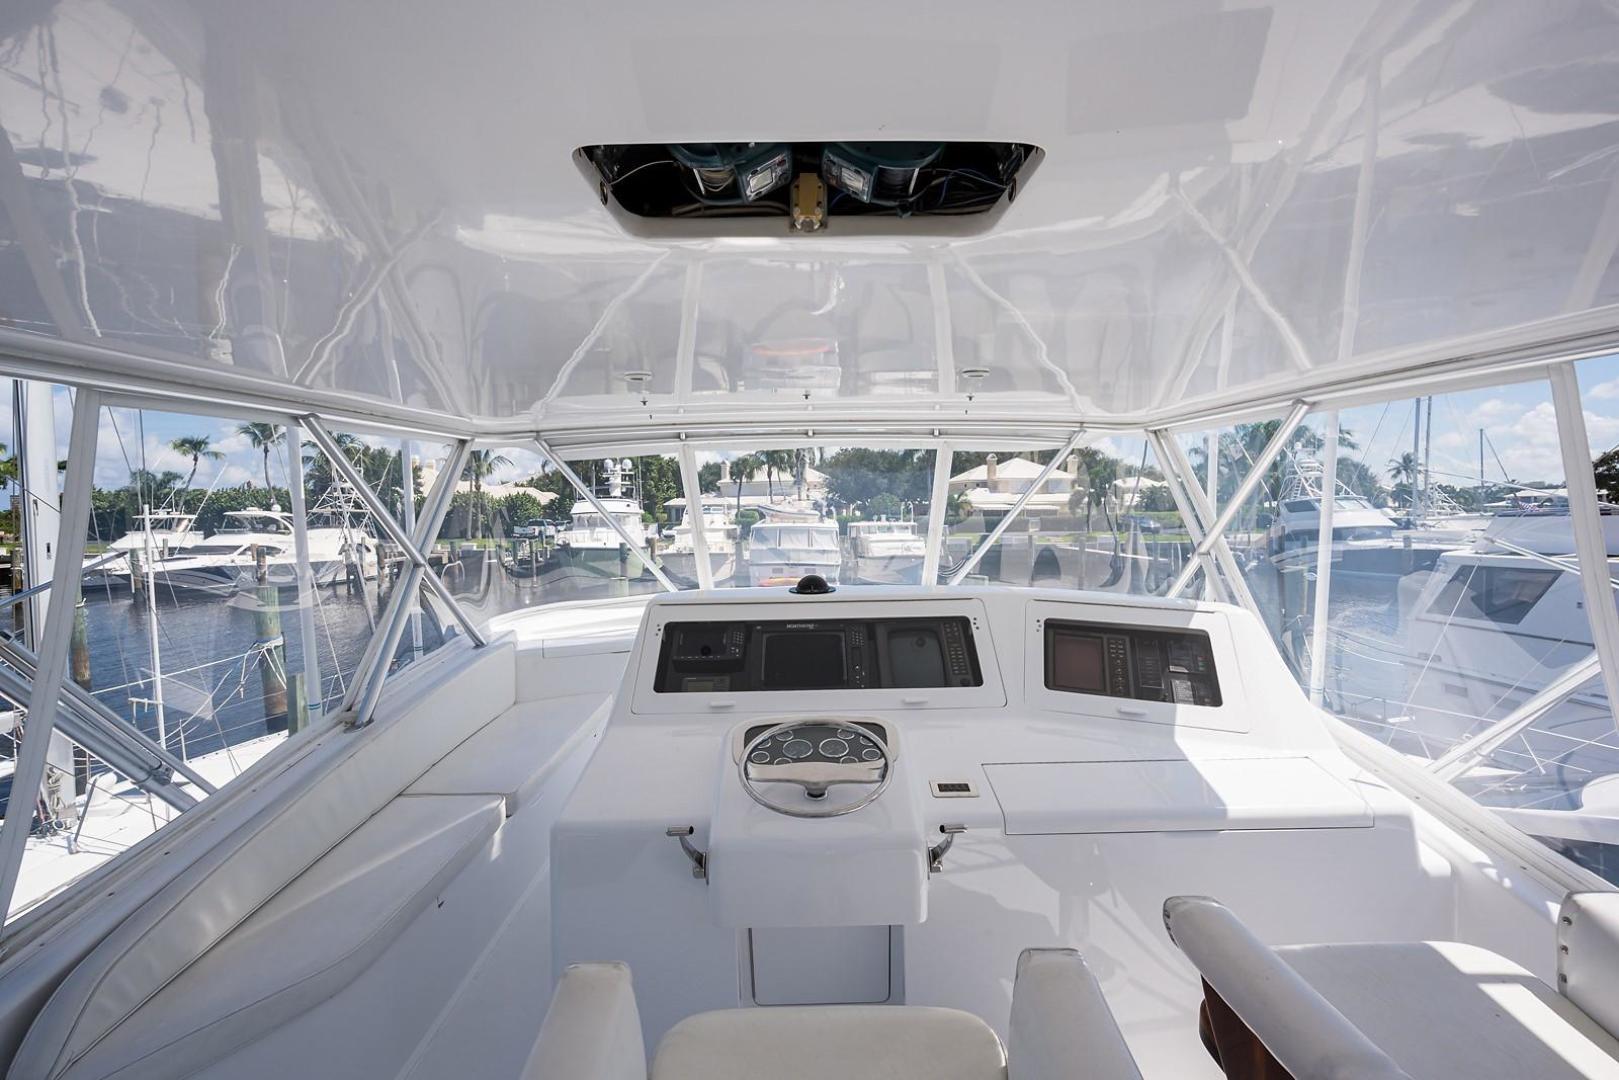 Viking-Convertible 2001-No Vacancy Palm Beach Gardens-Florida-United States-Flybridge-1499879 | Thumbnail